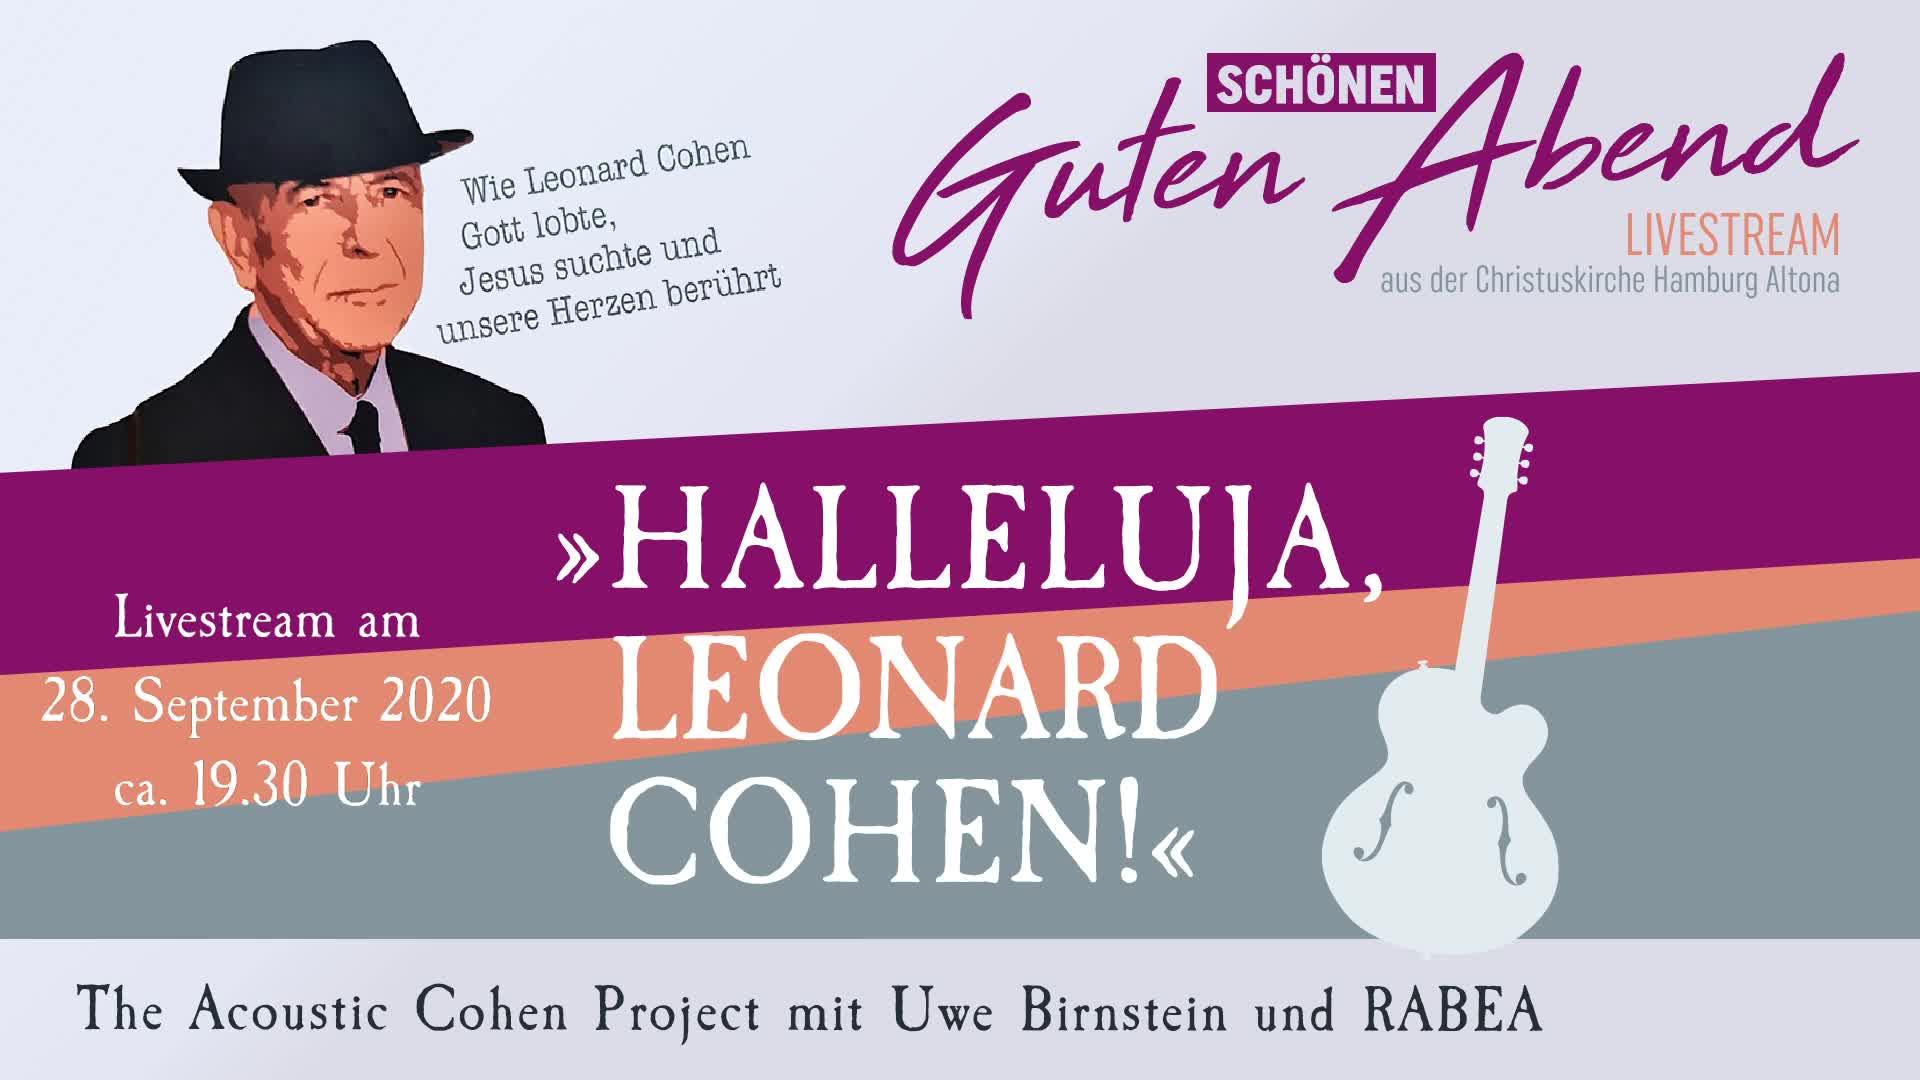 Halleluja, Leonard Cohen! - Teil 1